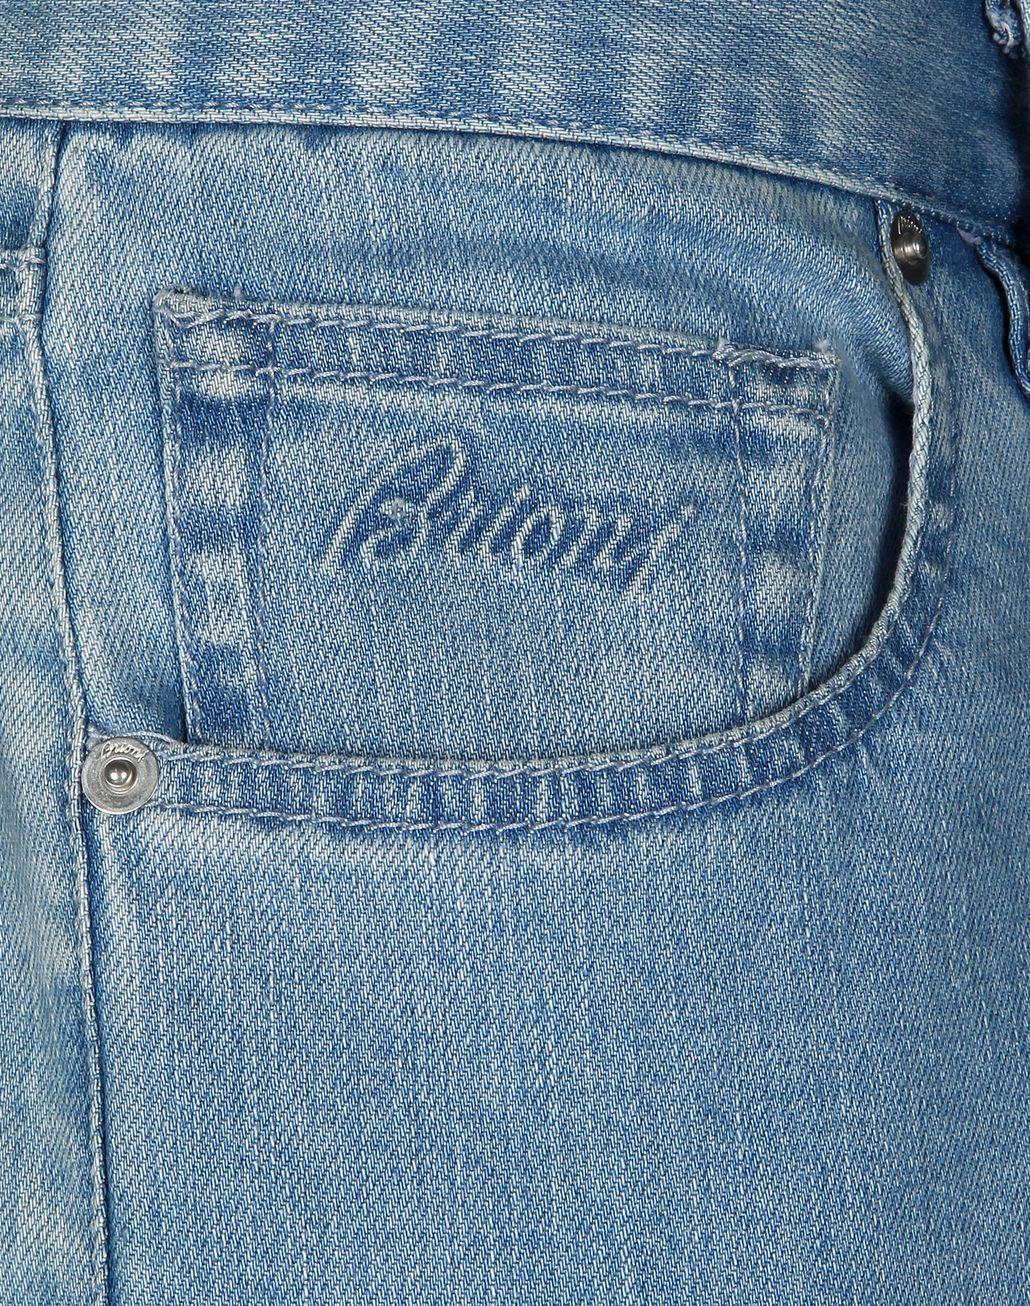 BRIONI Light Blue Denim Trousers Trousers Man e